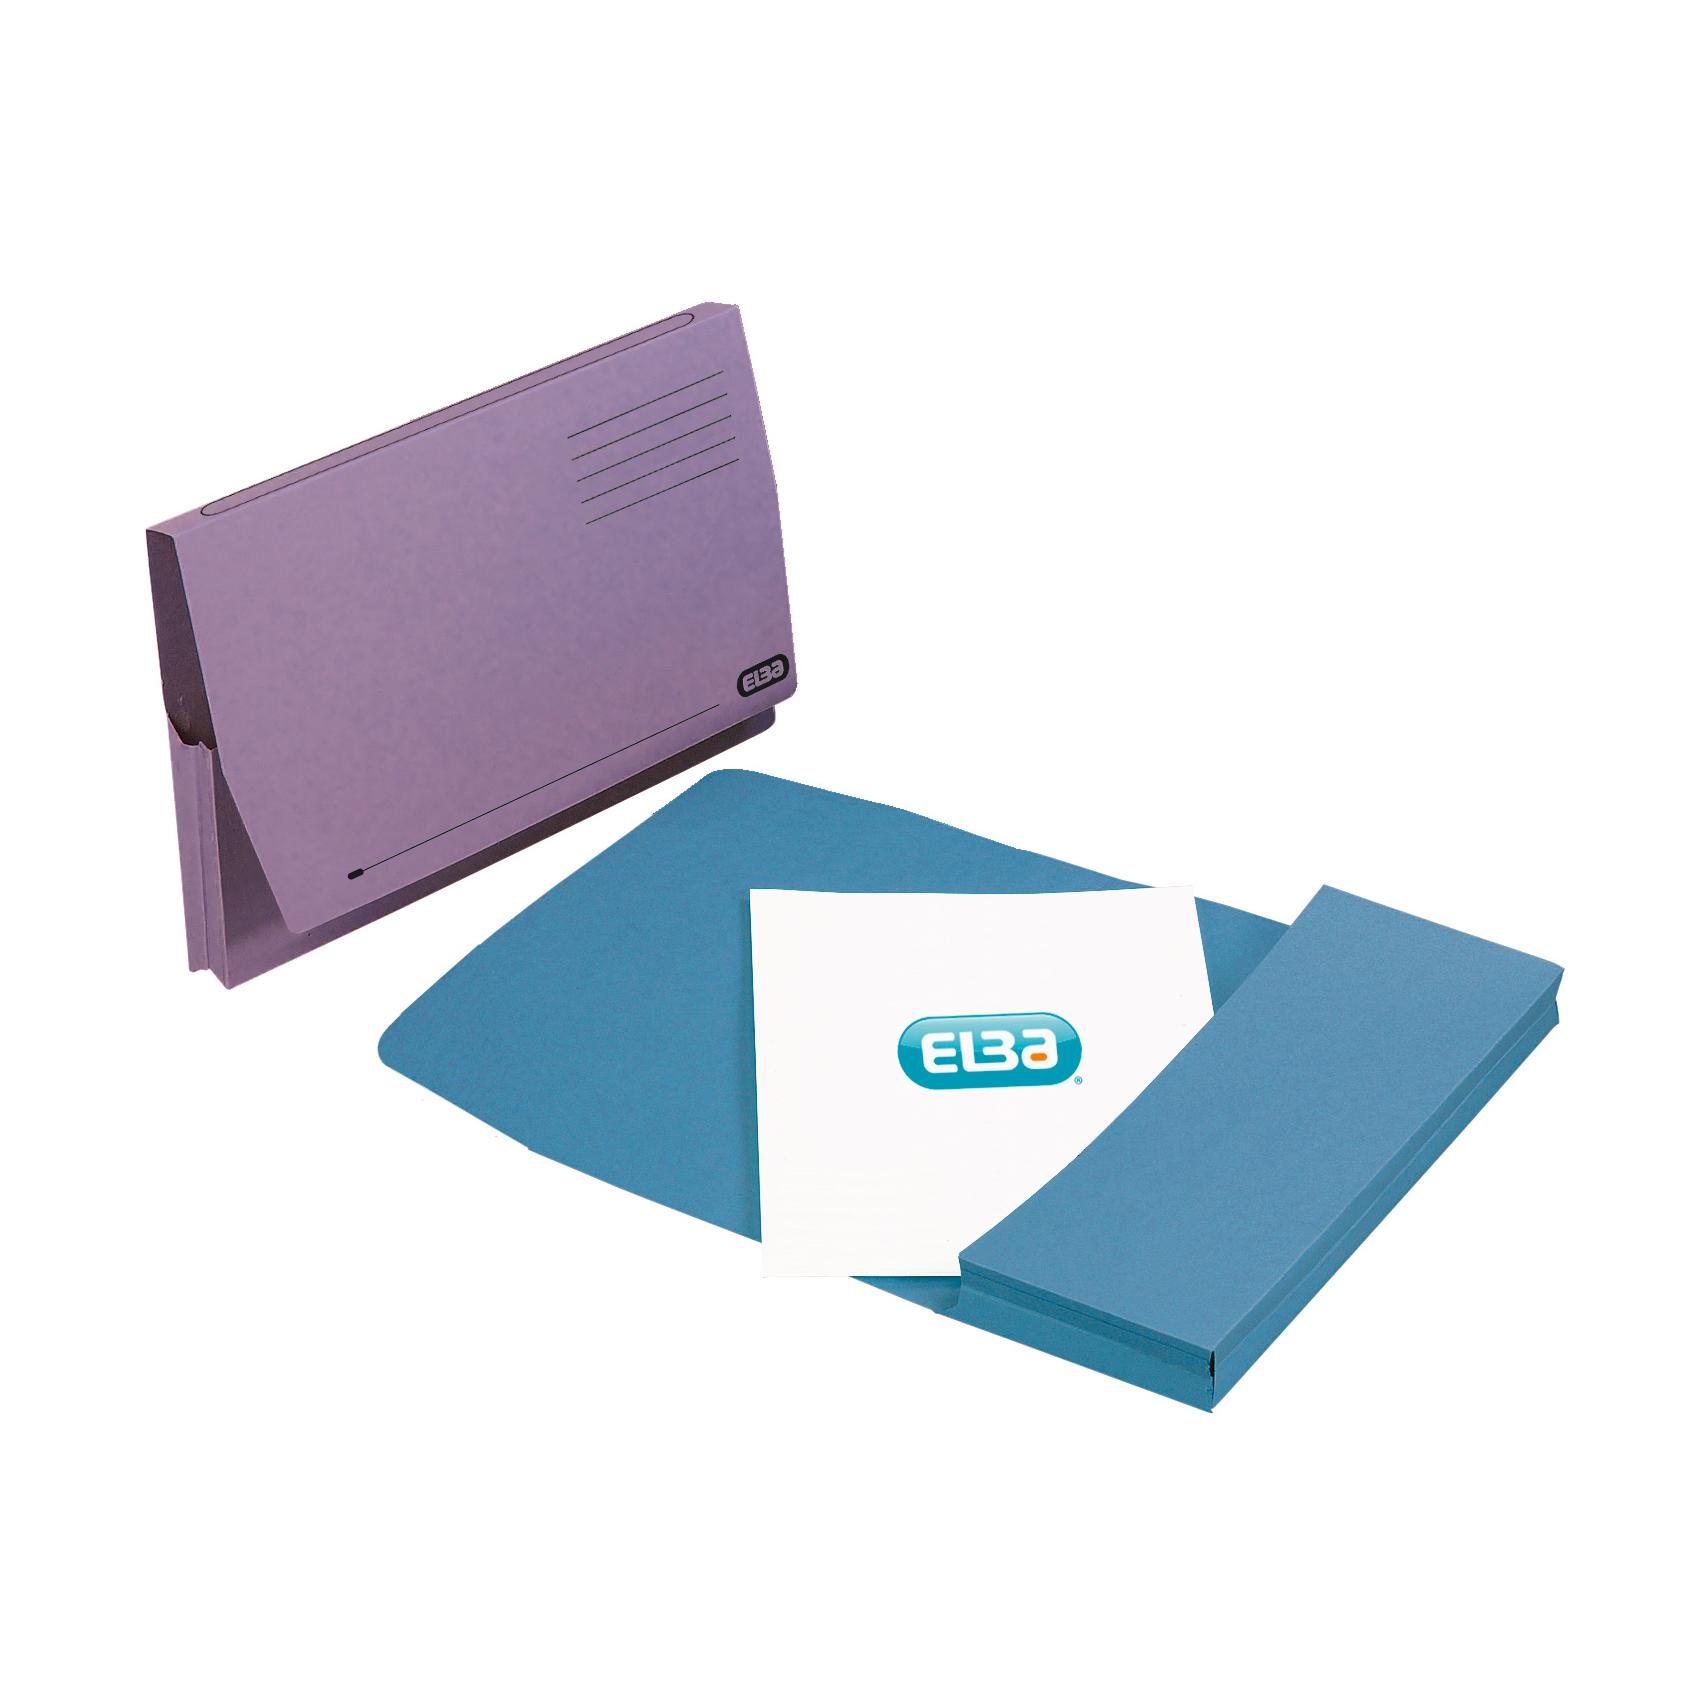 Elba Document Wallet Full Flap 285gsm Capacity 32mm Foolscap Blue Ref 100090131 Pack 50